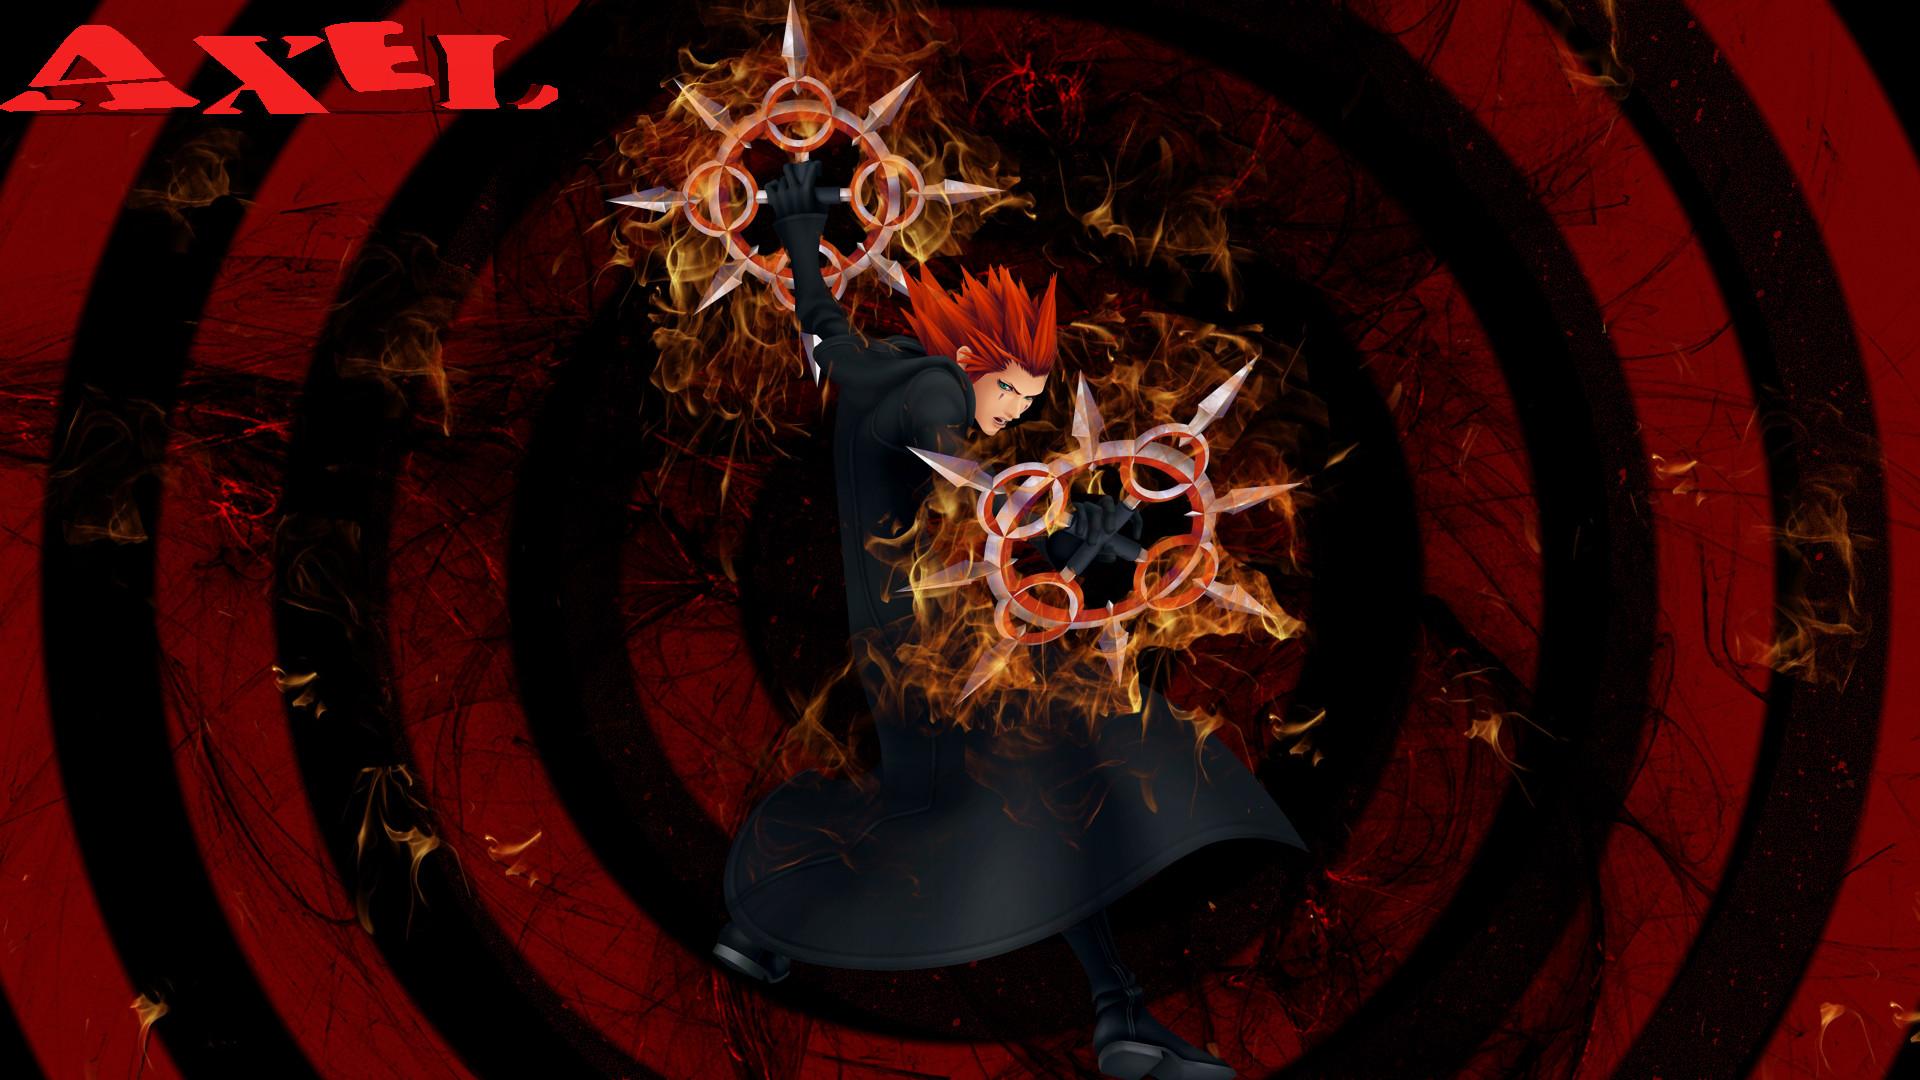 Axel Kingdom Hearts Wallpaper by static989 Axel Kingdom Hearts Wallpaper by  static989